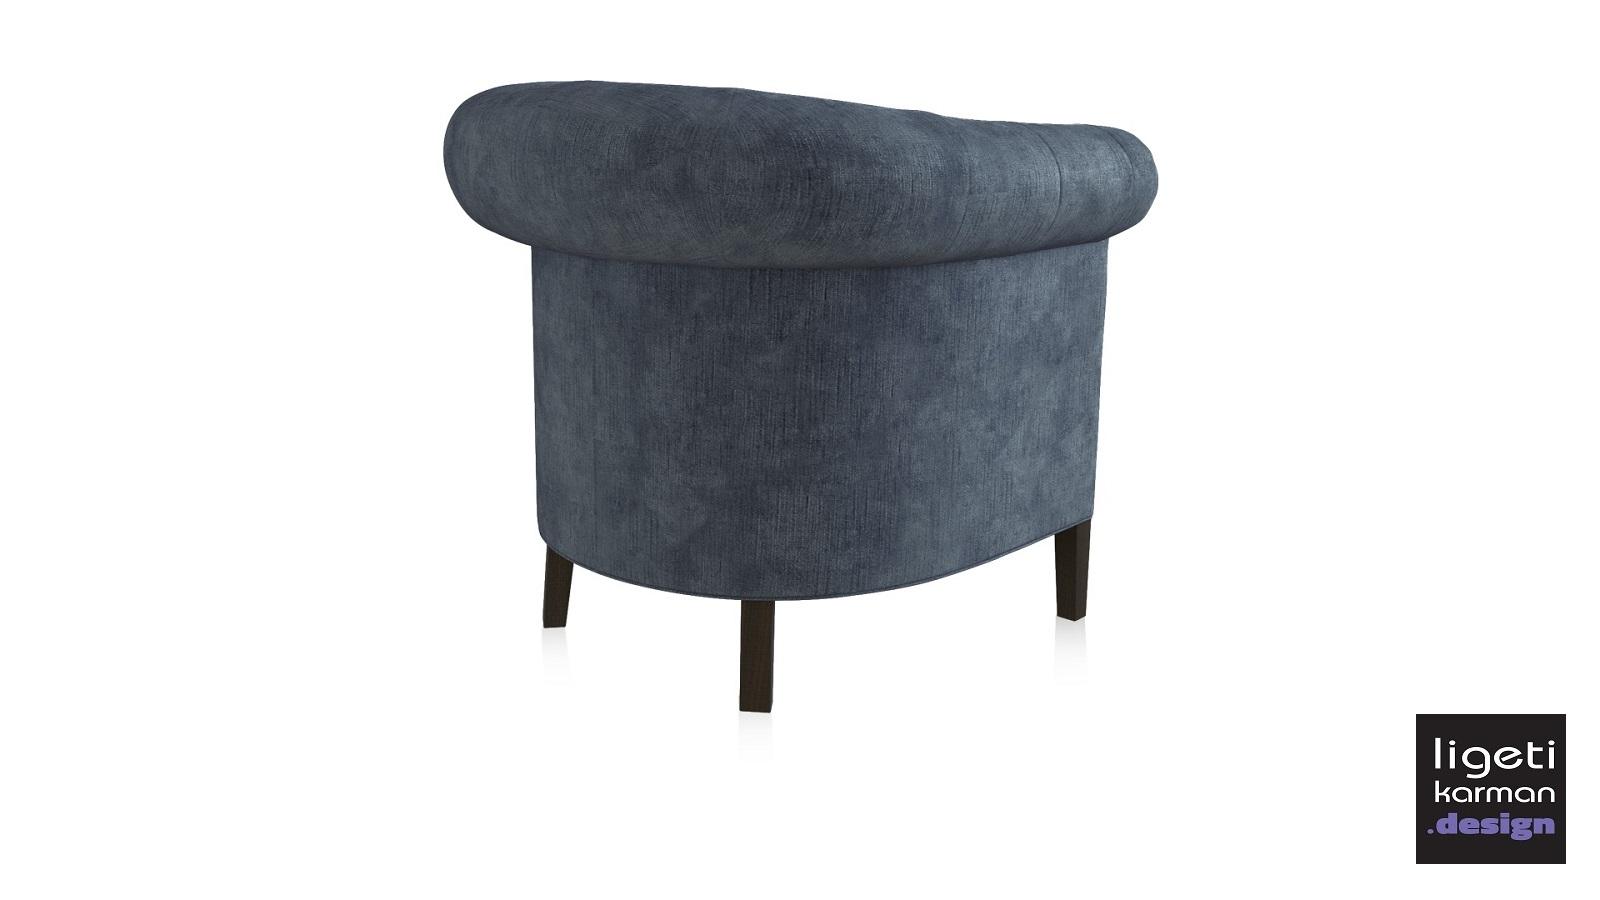 miotto_pitto armchair dark blue back t